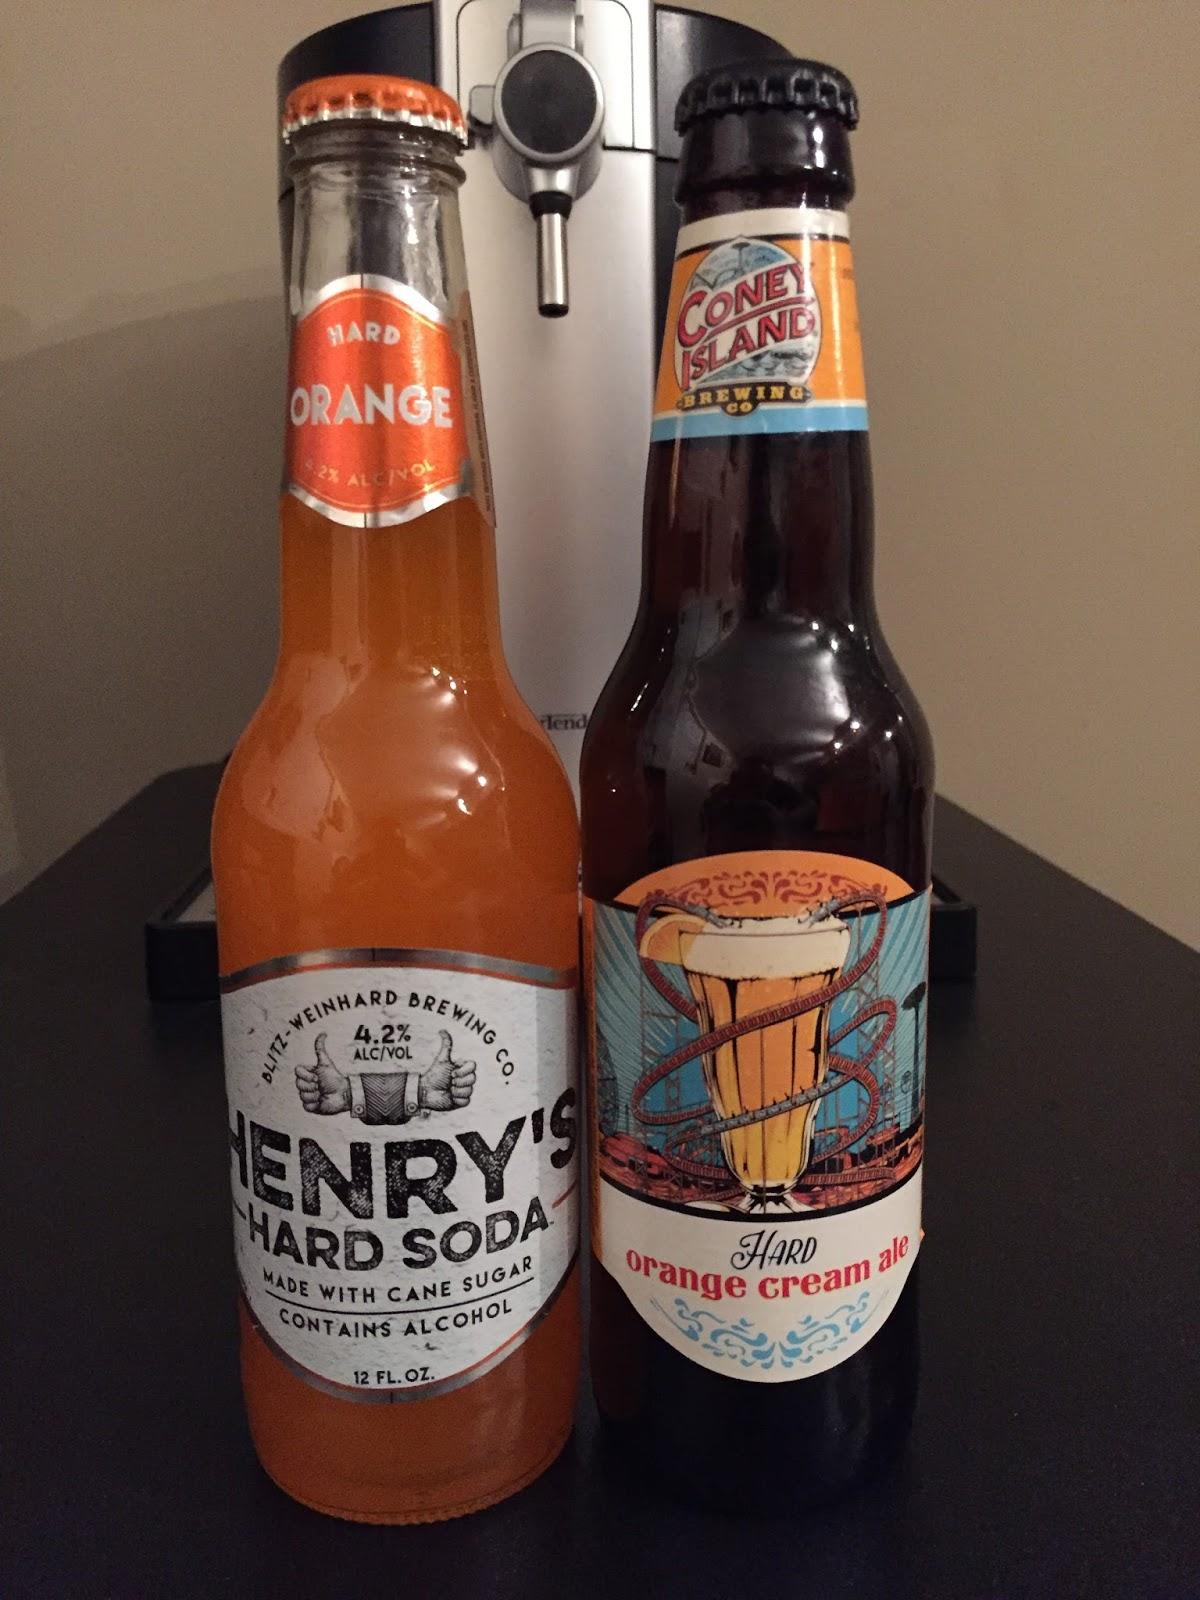 Coney Island Hard Soda Introduction